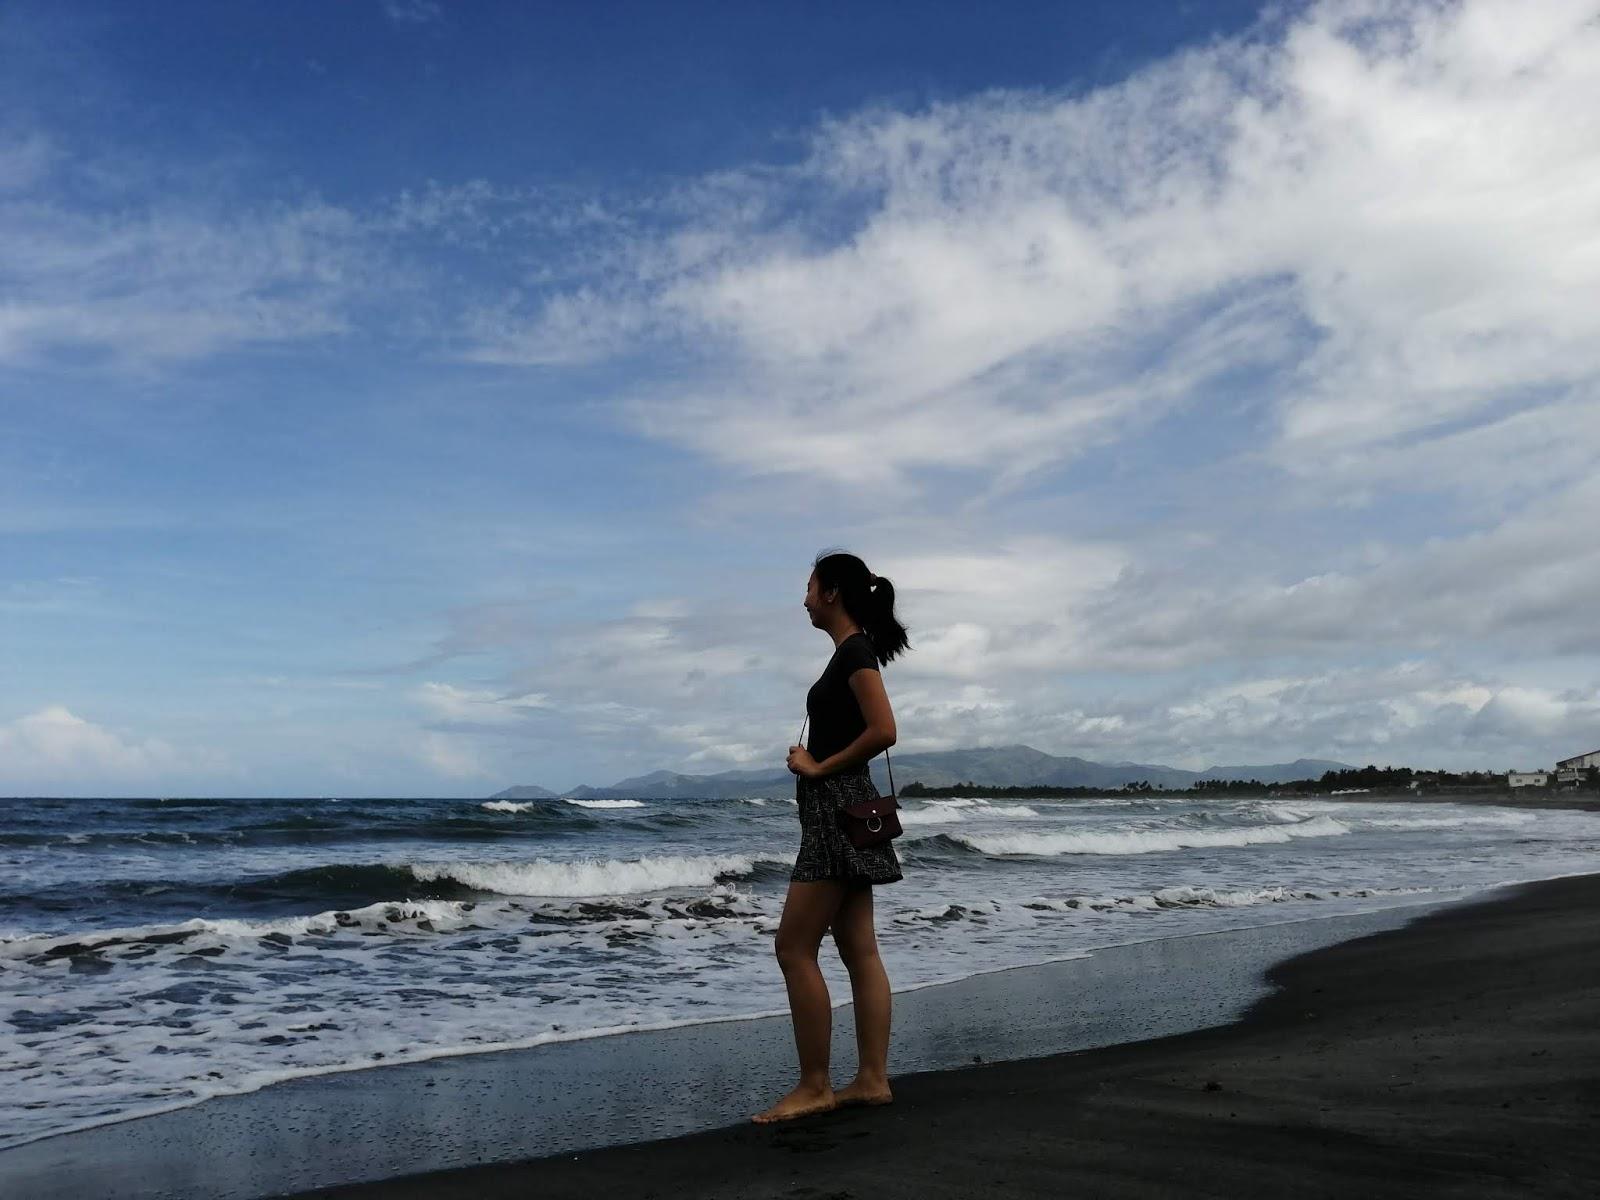 Life blogger Teresa Gueco wrote a letter